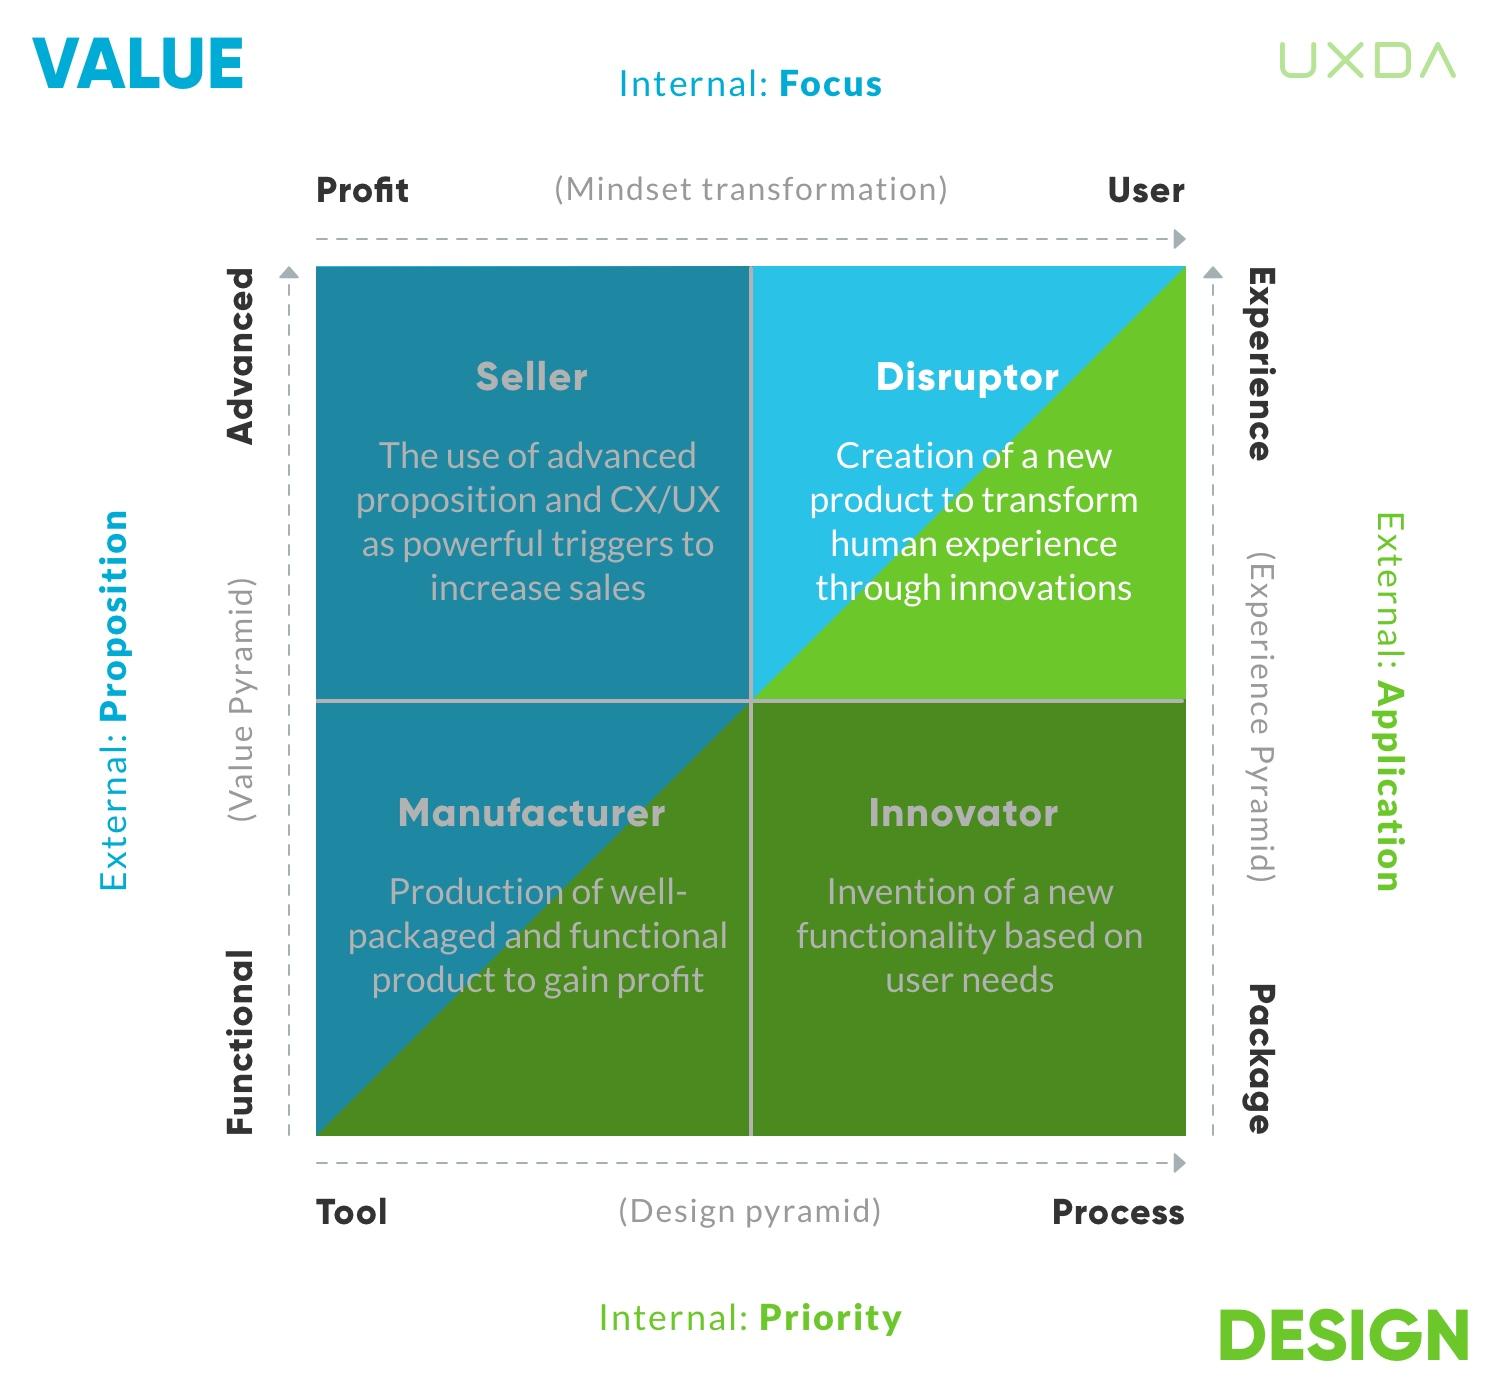 financial-design-matrix-for-banking-disruption-4.jpg